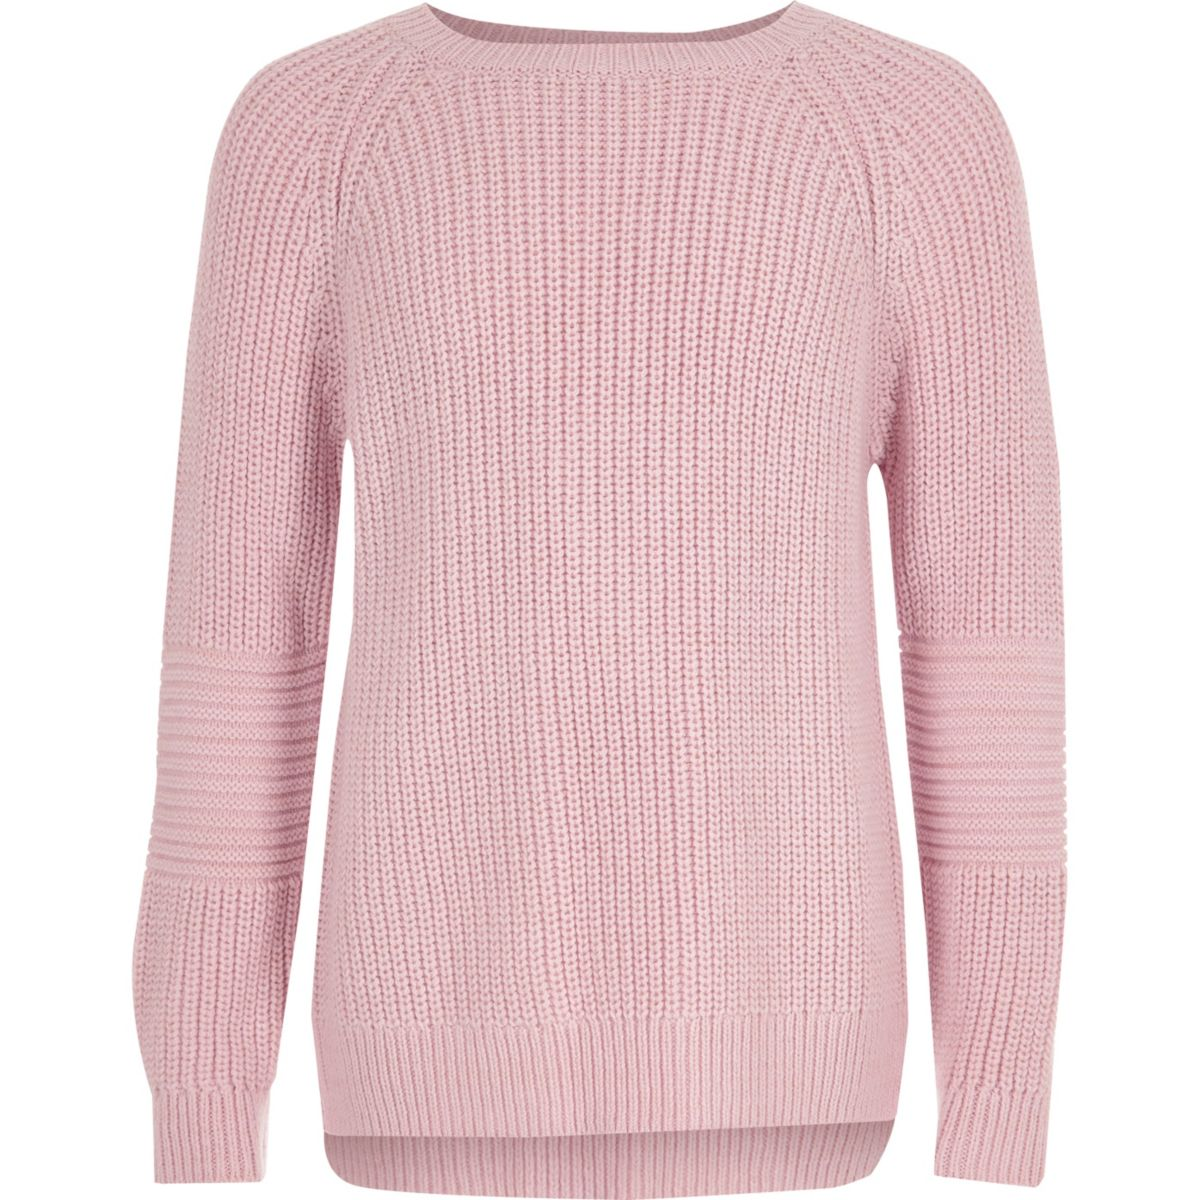 Girls pink cross open back knit jumper